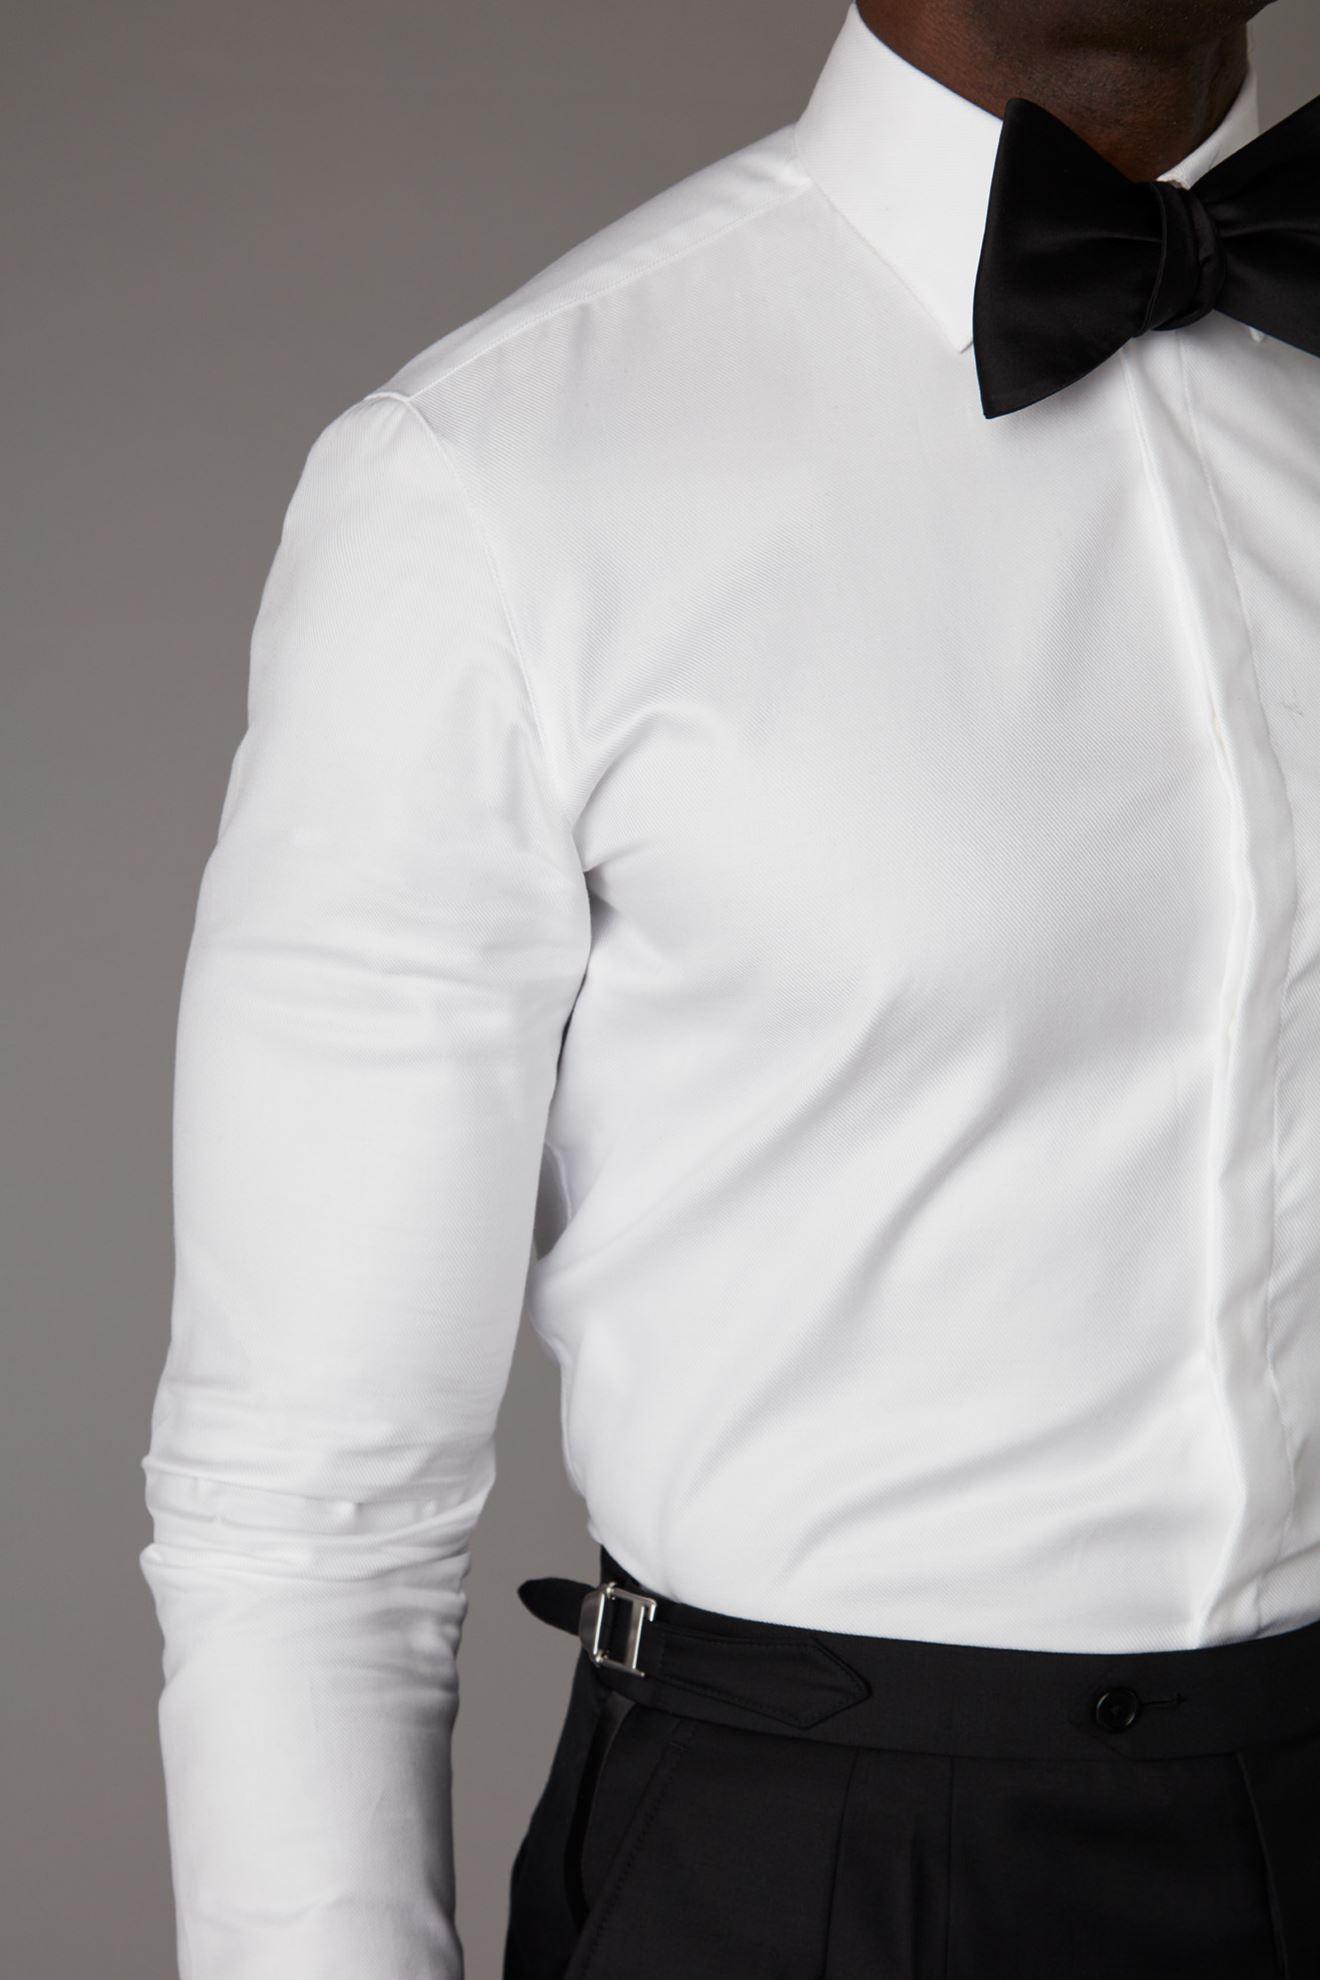 Picture of White Tuxedo Shirt